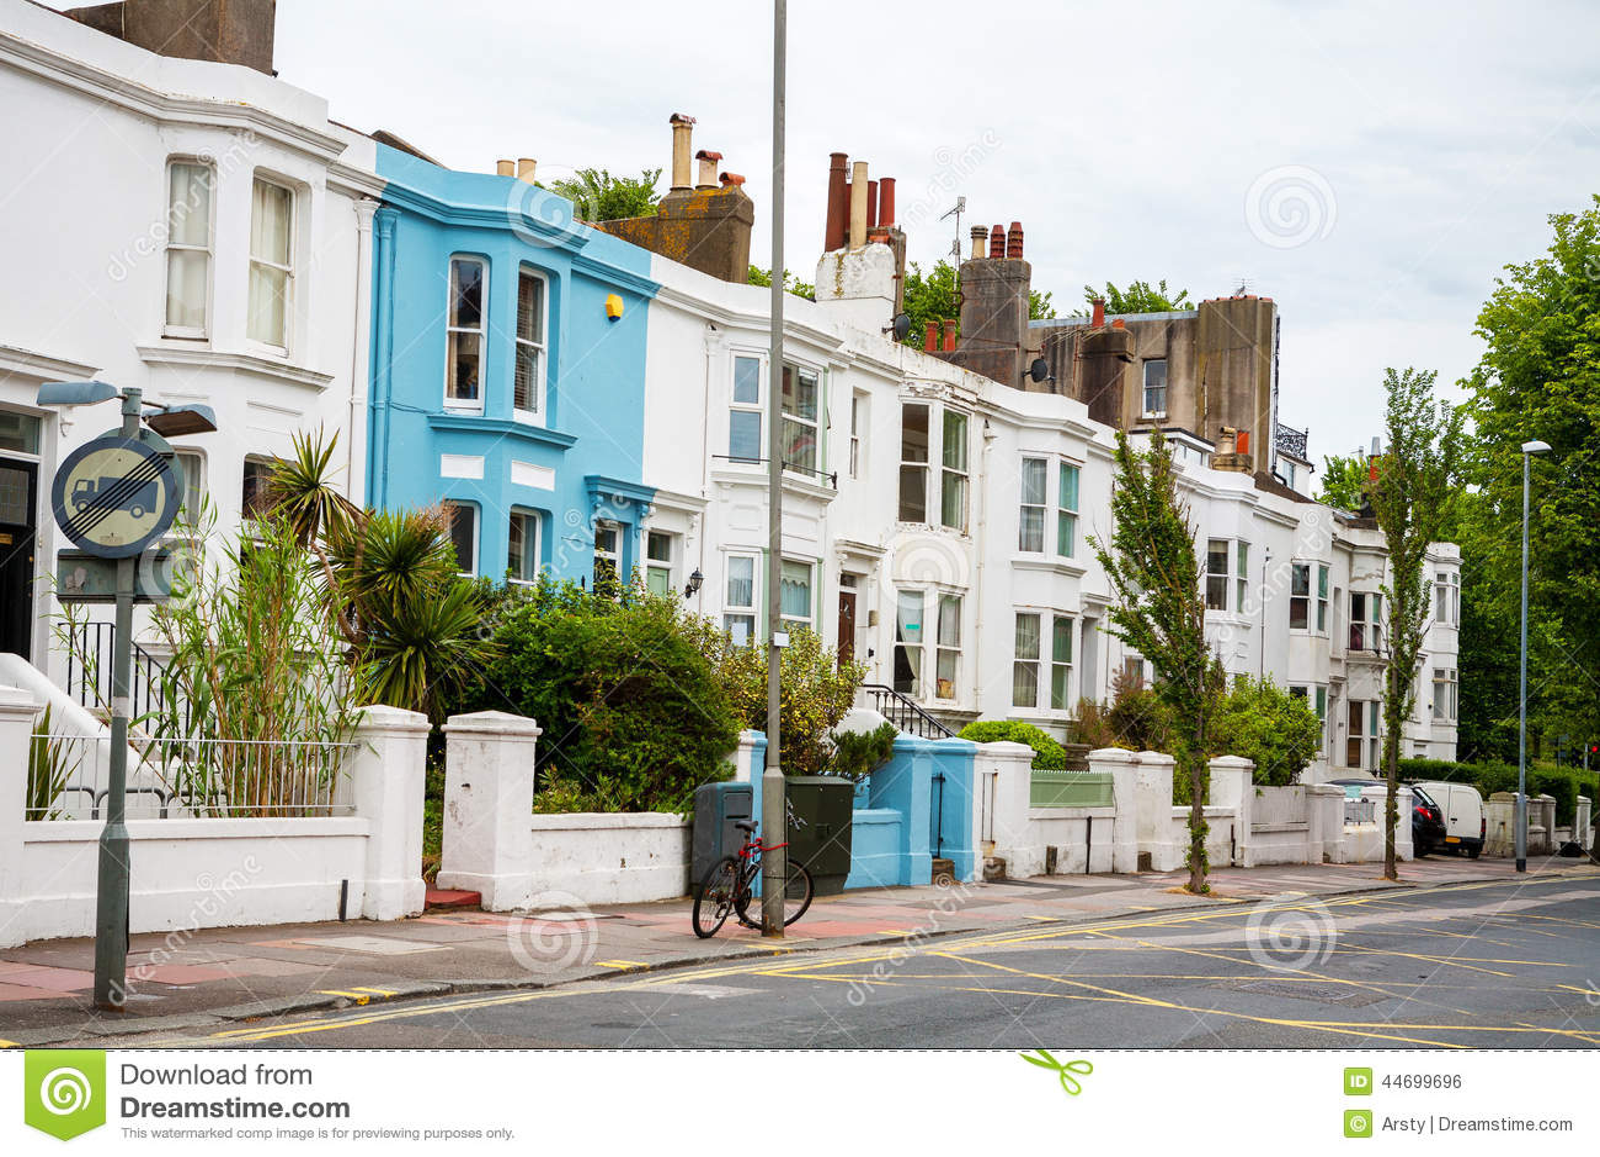 England Apartment Building